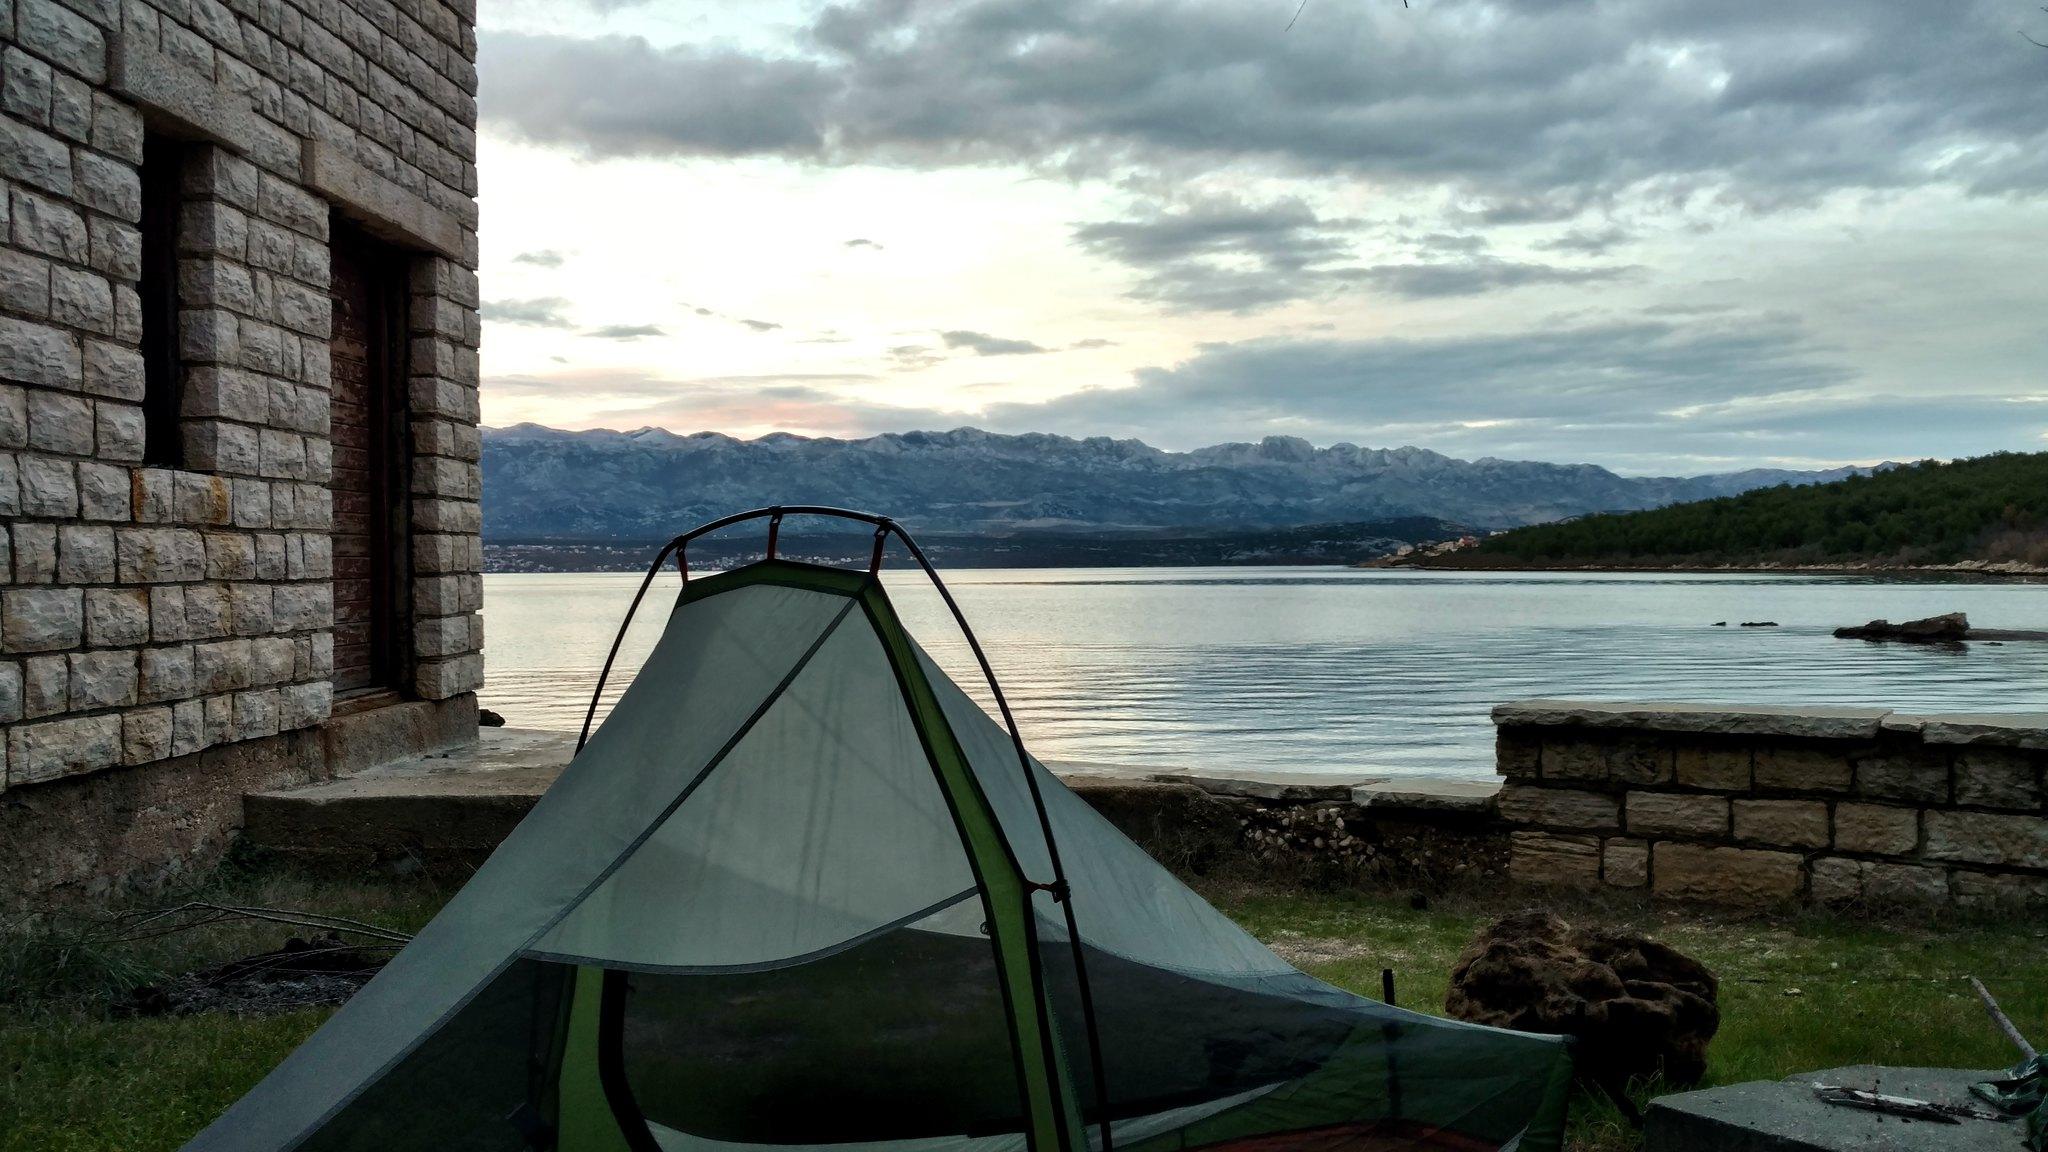 Stealth camp at the beach